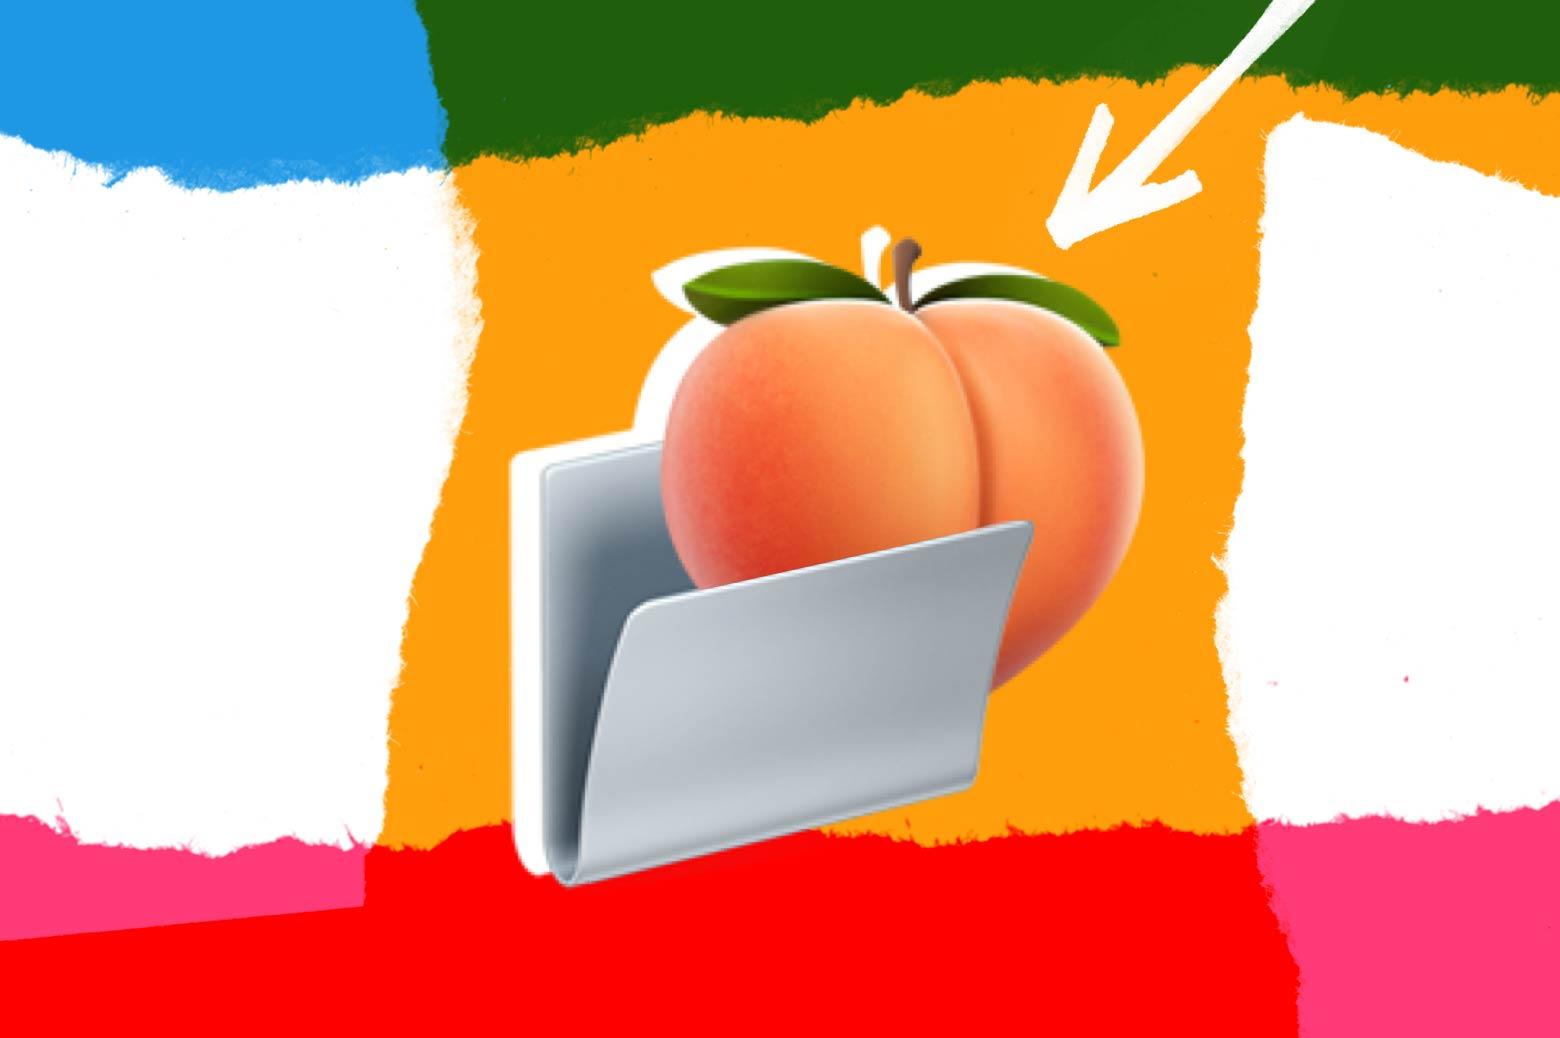 A peach emoji nestling into a folder emoji.